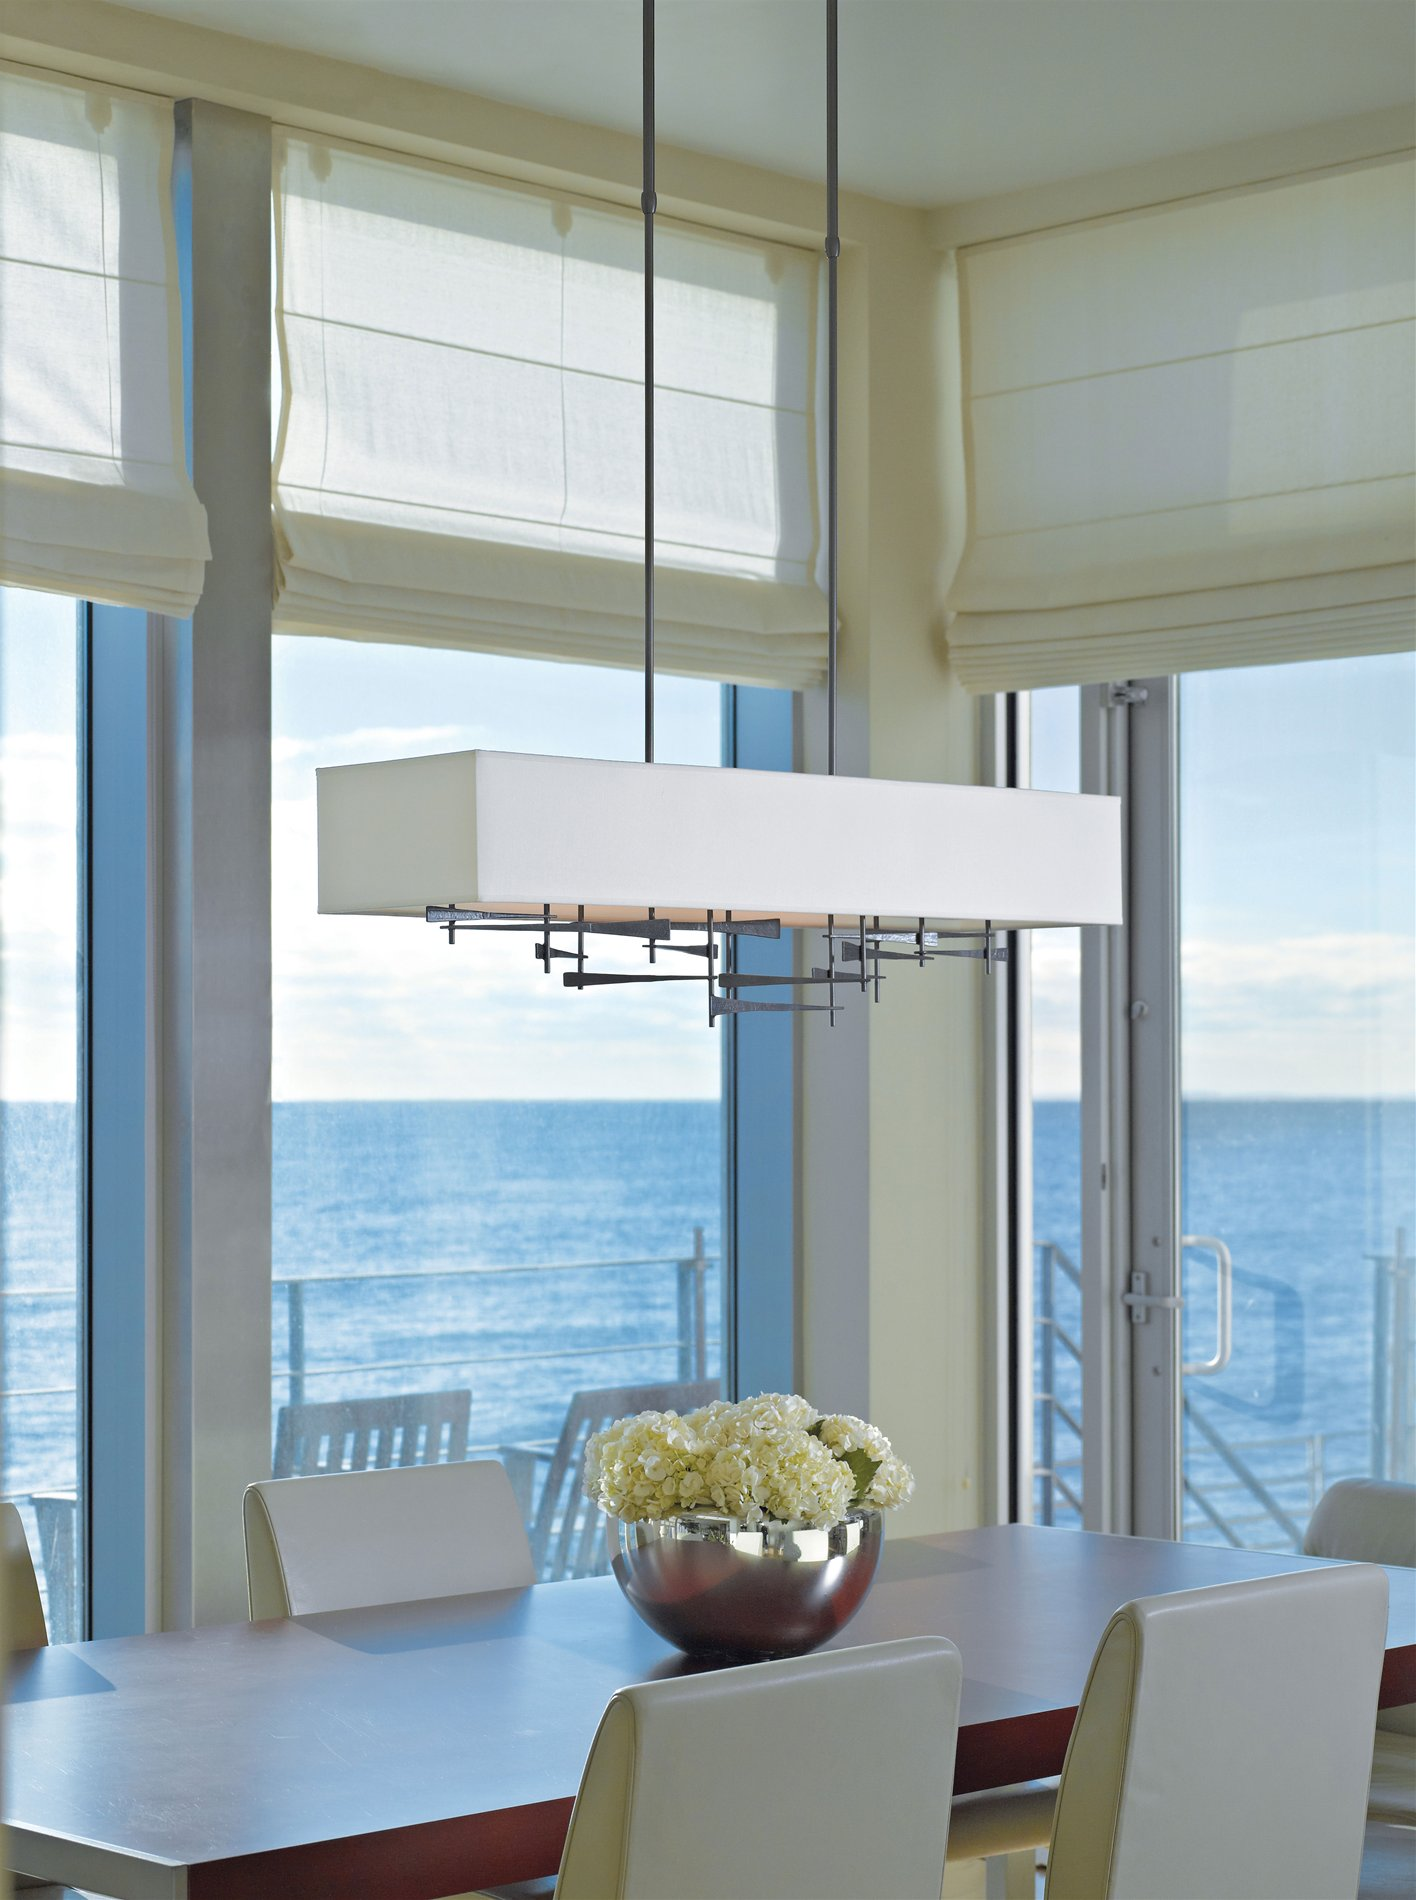 Hubbardton Forge 137670 Cavaletti Contemporary Kitchen Island Light ...